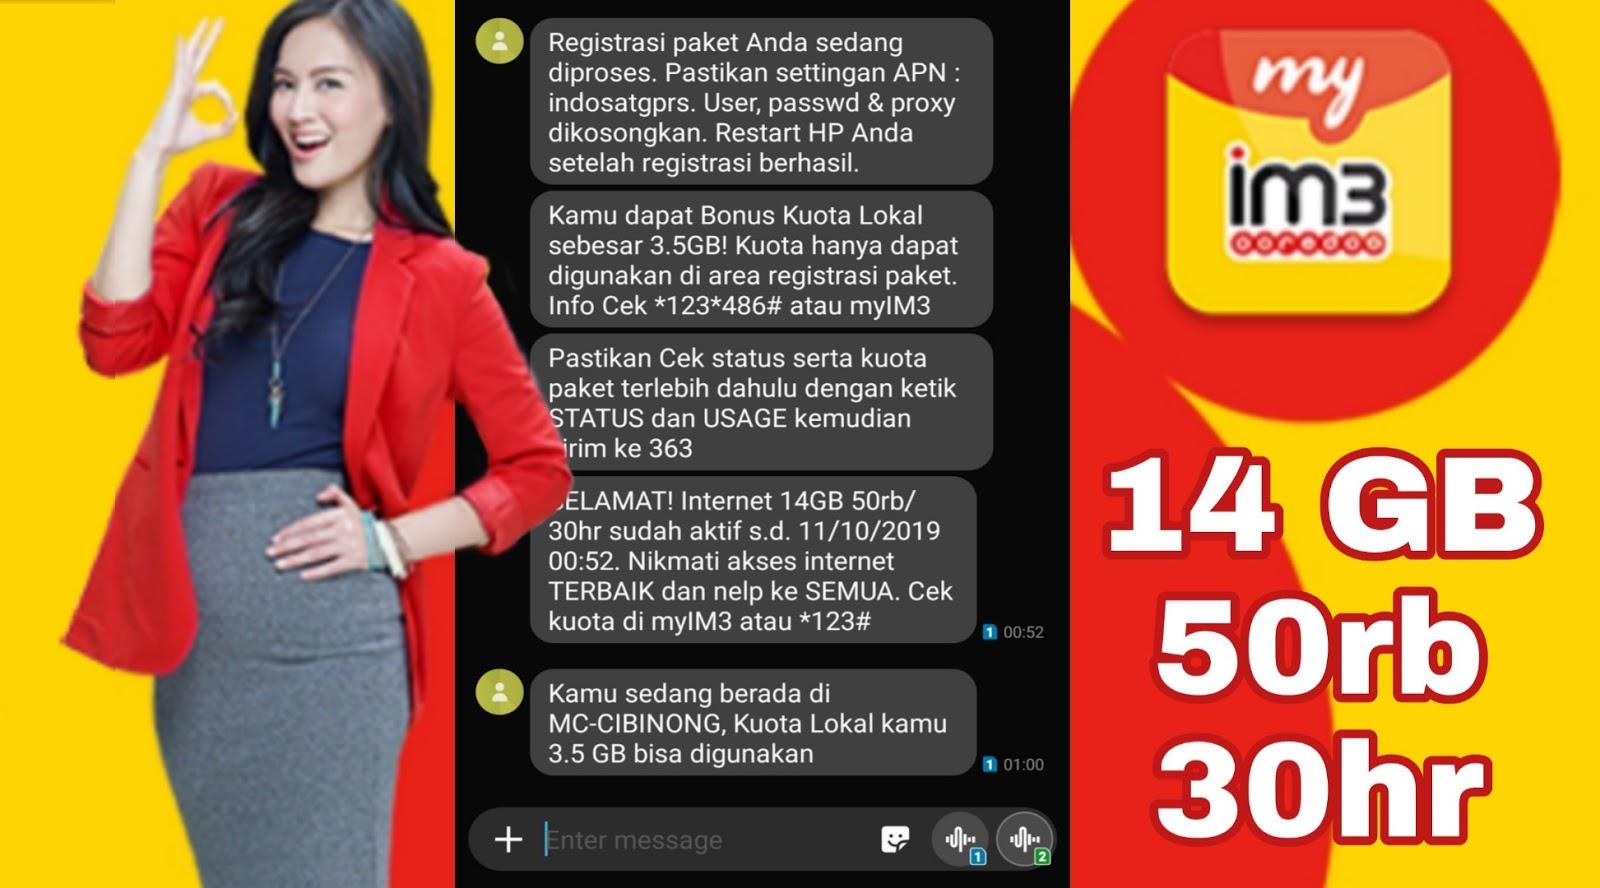 Aha Sarang Komputer 14 Gb Hanya 50000 Untuk 30 Hari Dari Indosat Im3